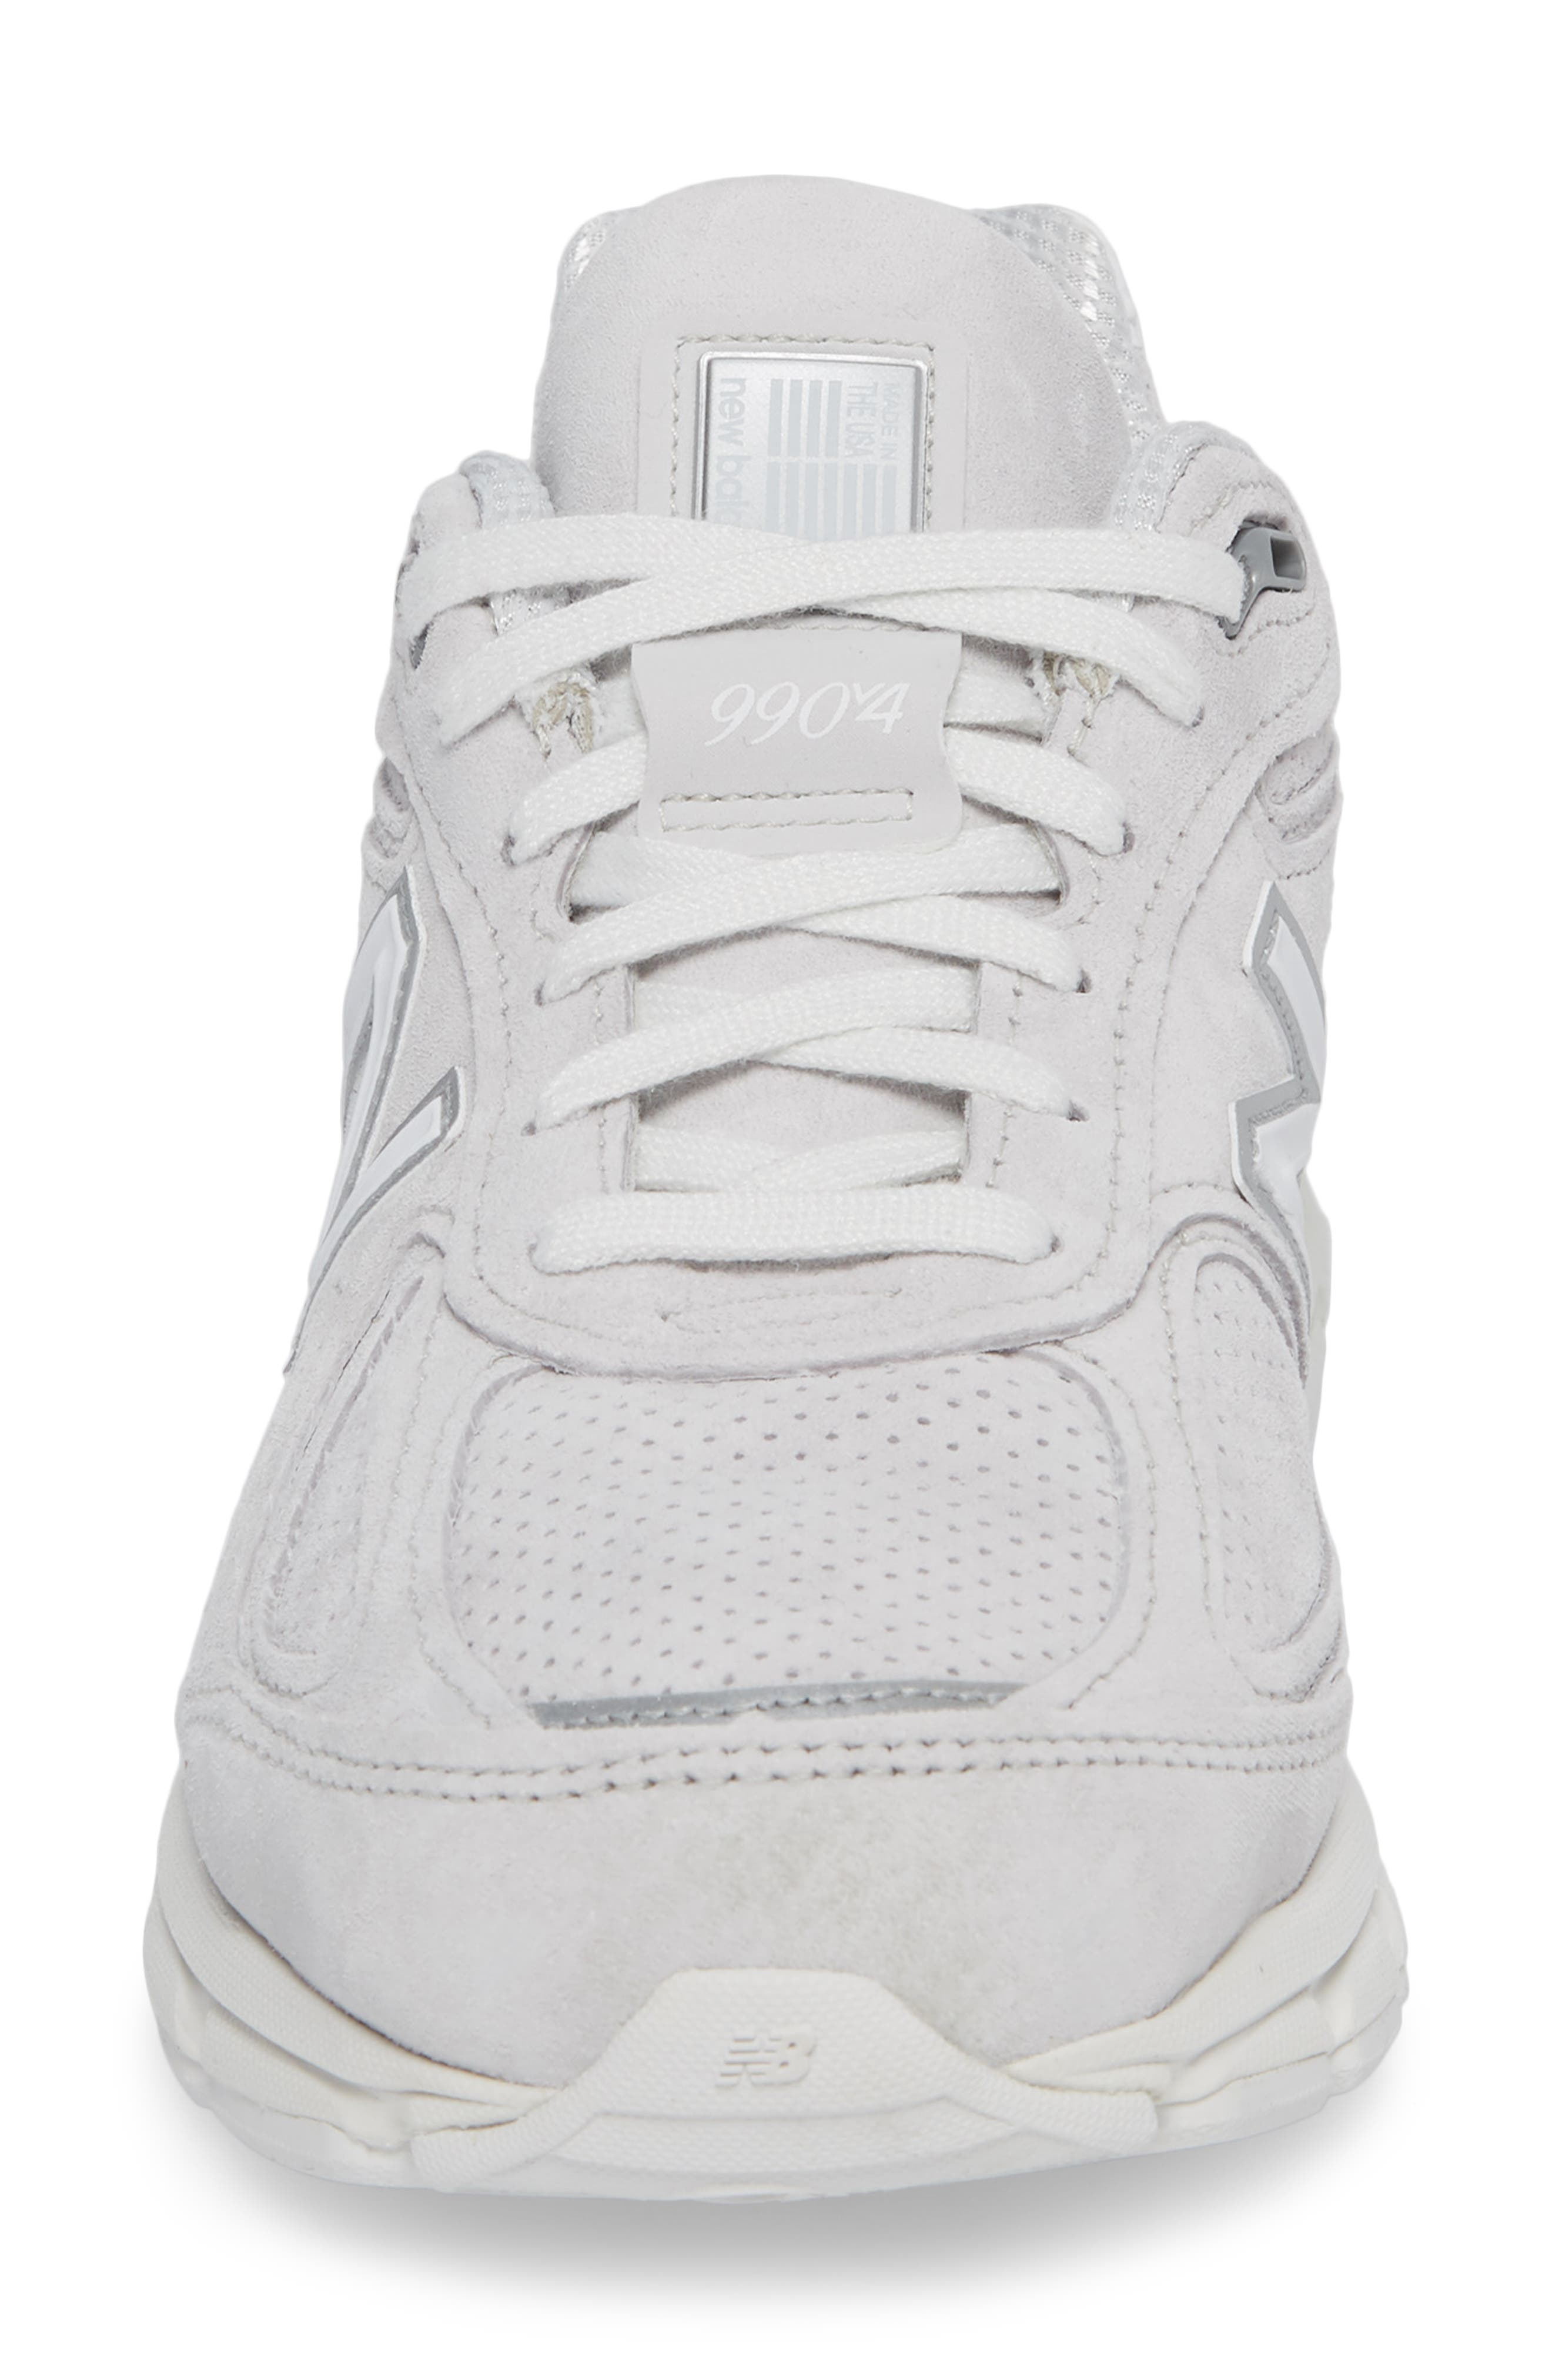 990v4 Perforated Sneaker,                             Alternate thumbnail 4, color,                             Arctic Fox